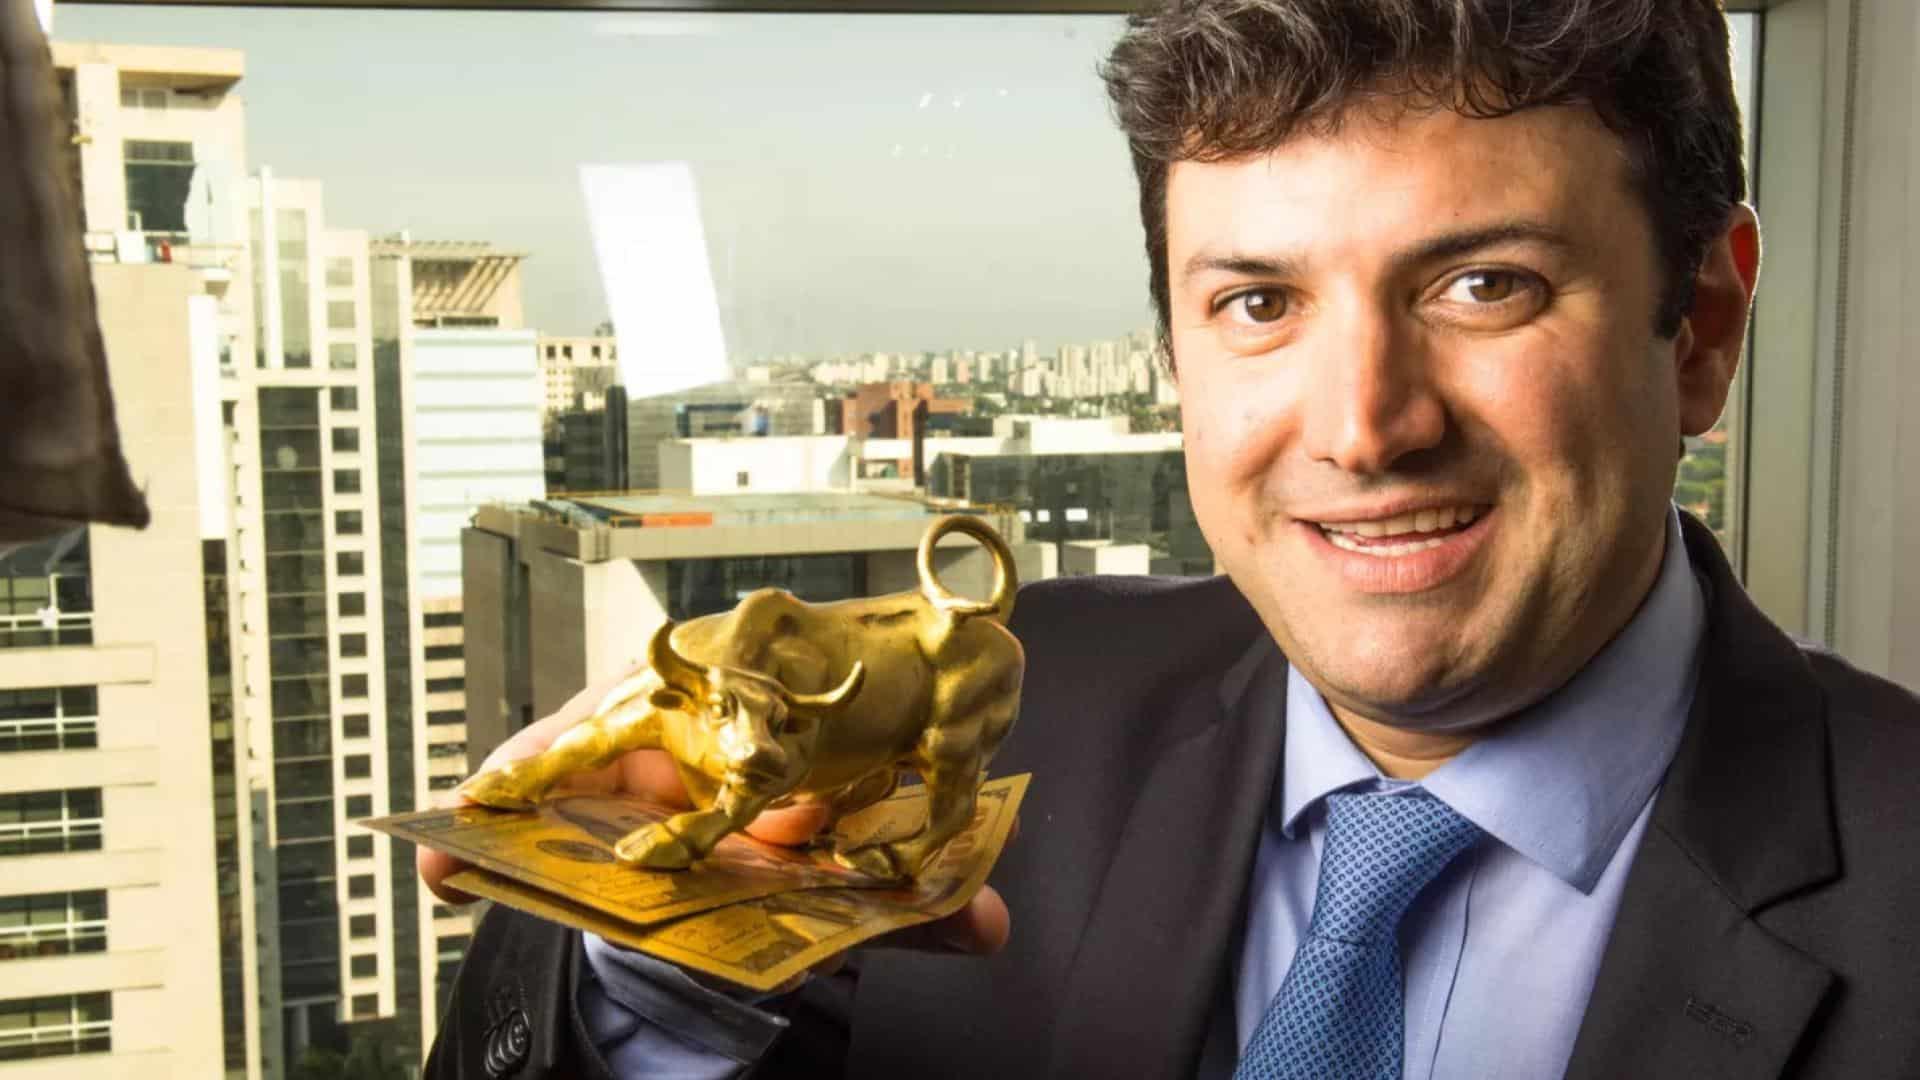 Pablo Spyer e Luiz Fernando Roxo – Como a pandemia afetou as bolsas e seus investimentos #MoneyWeek